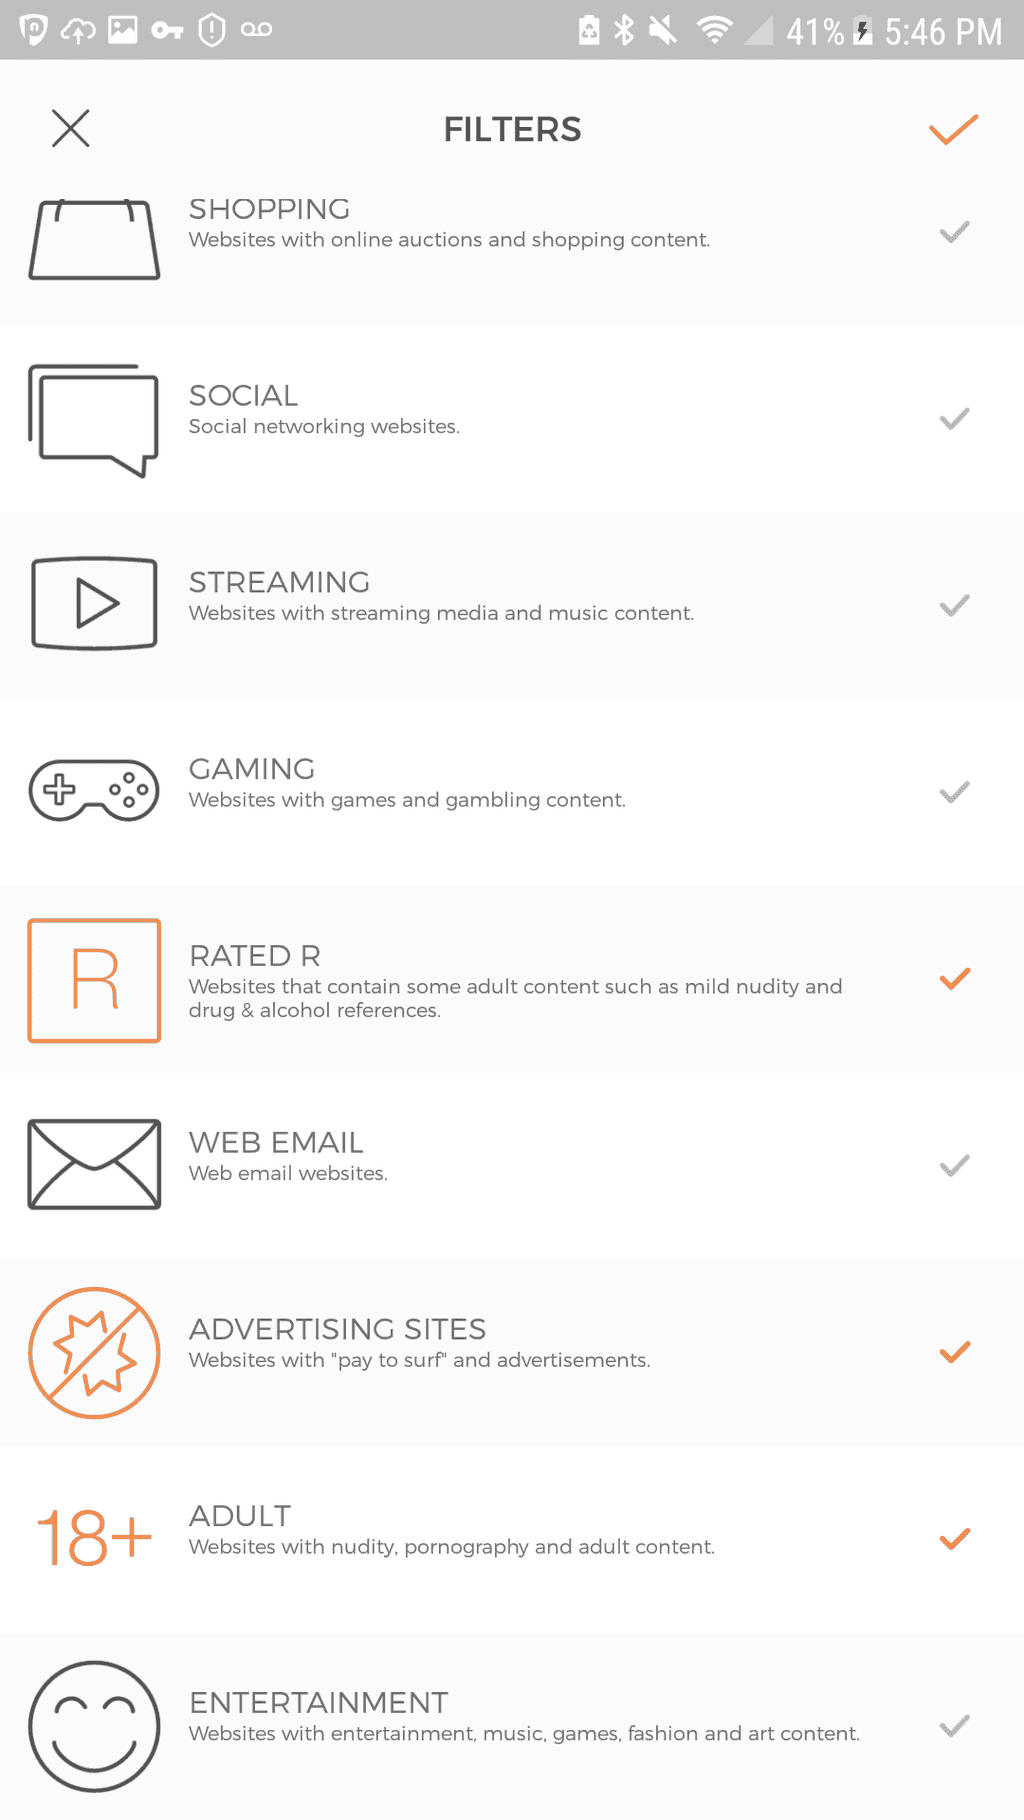 screenshot of the internet filters using cujo